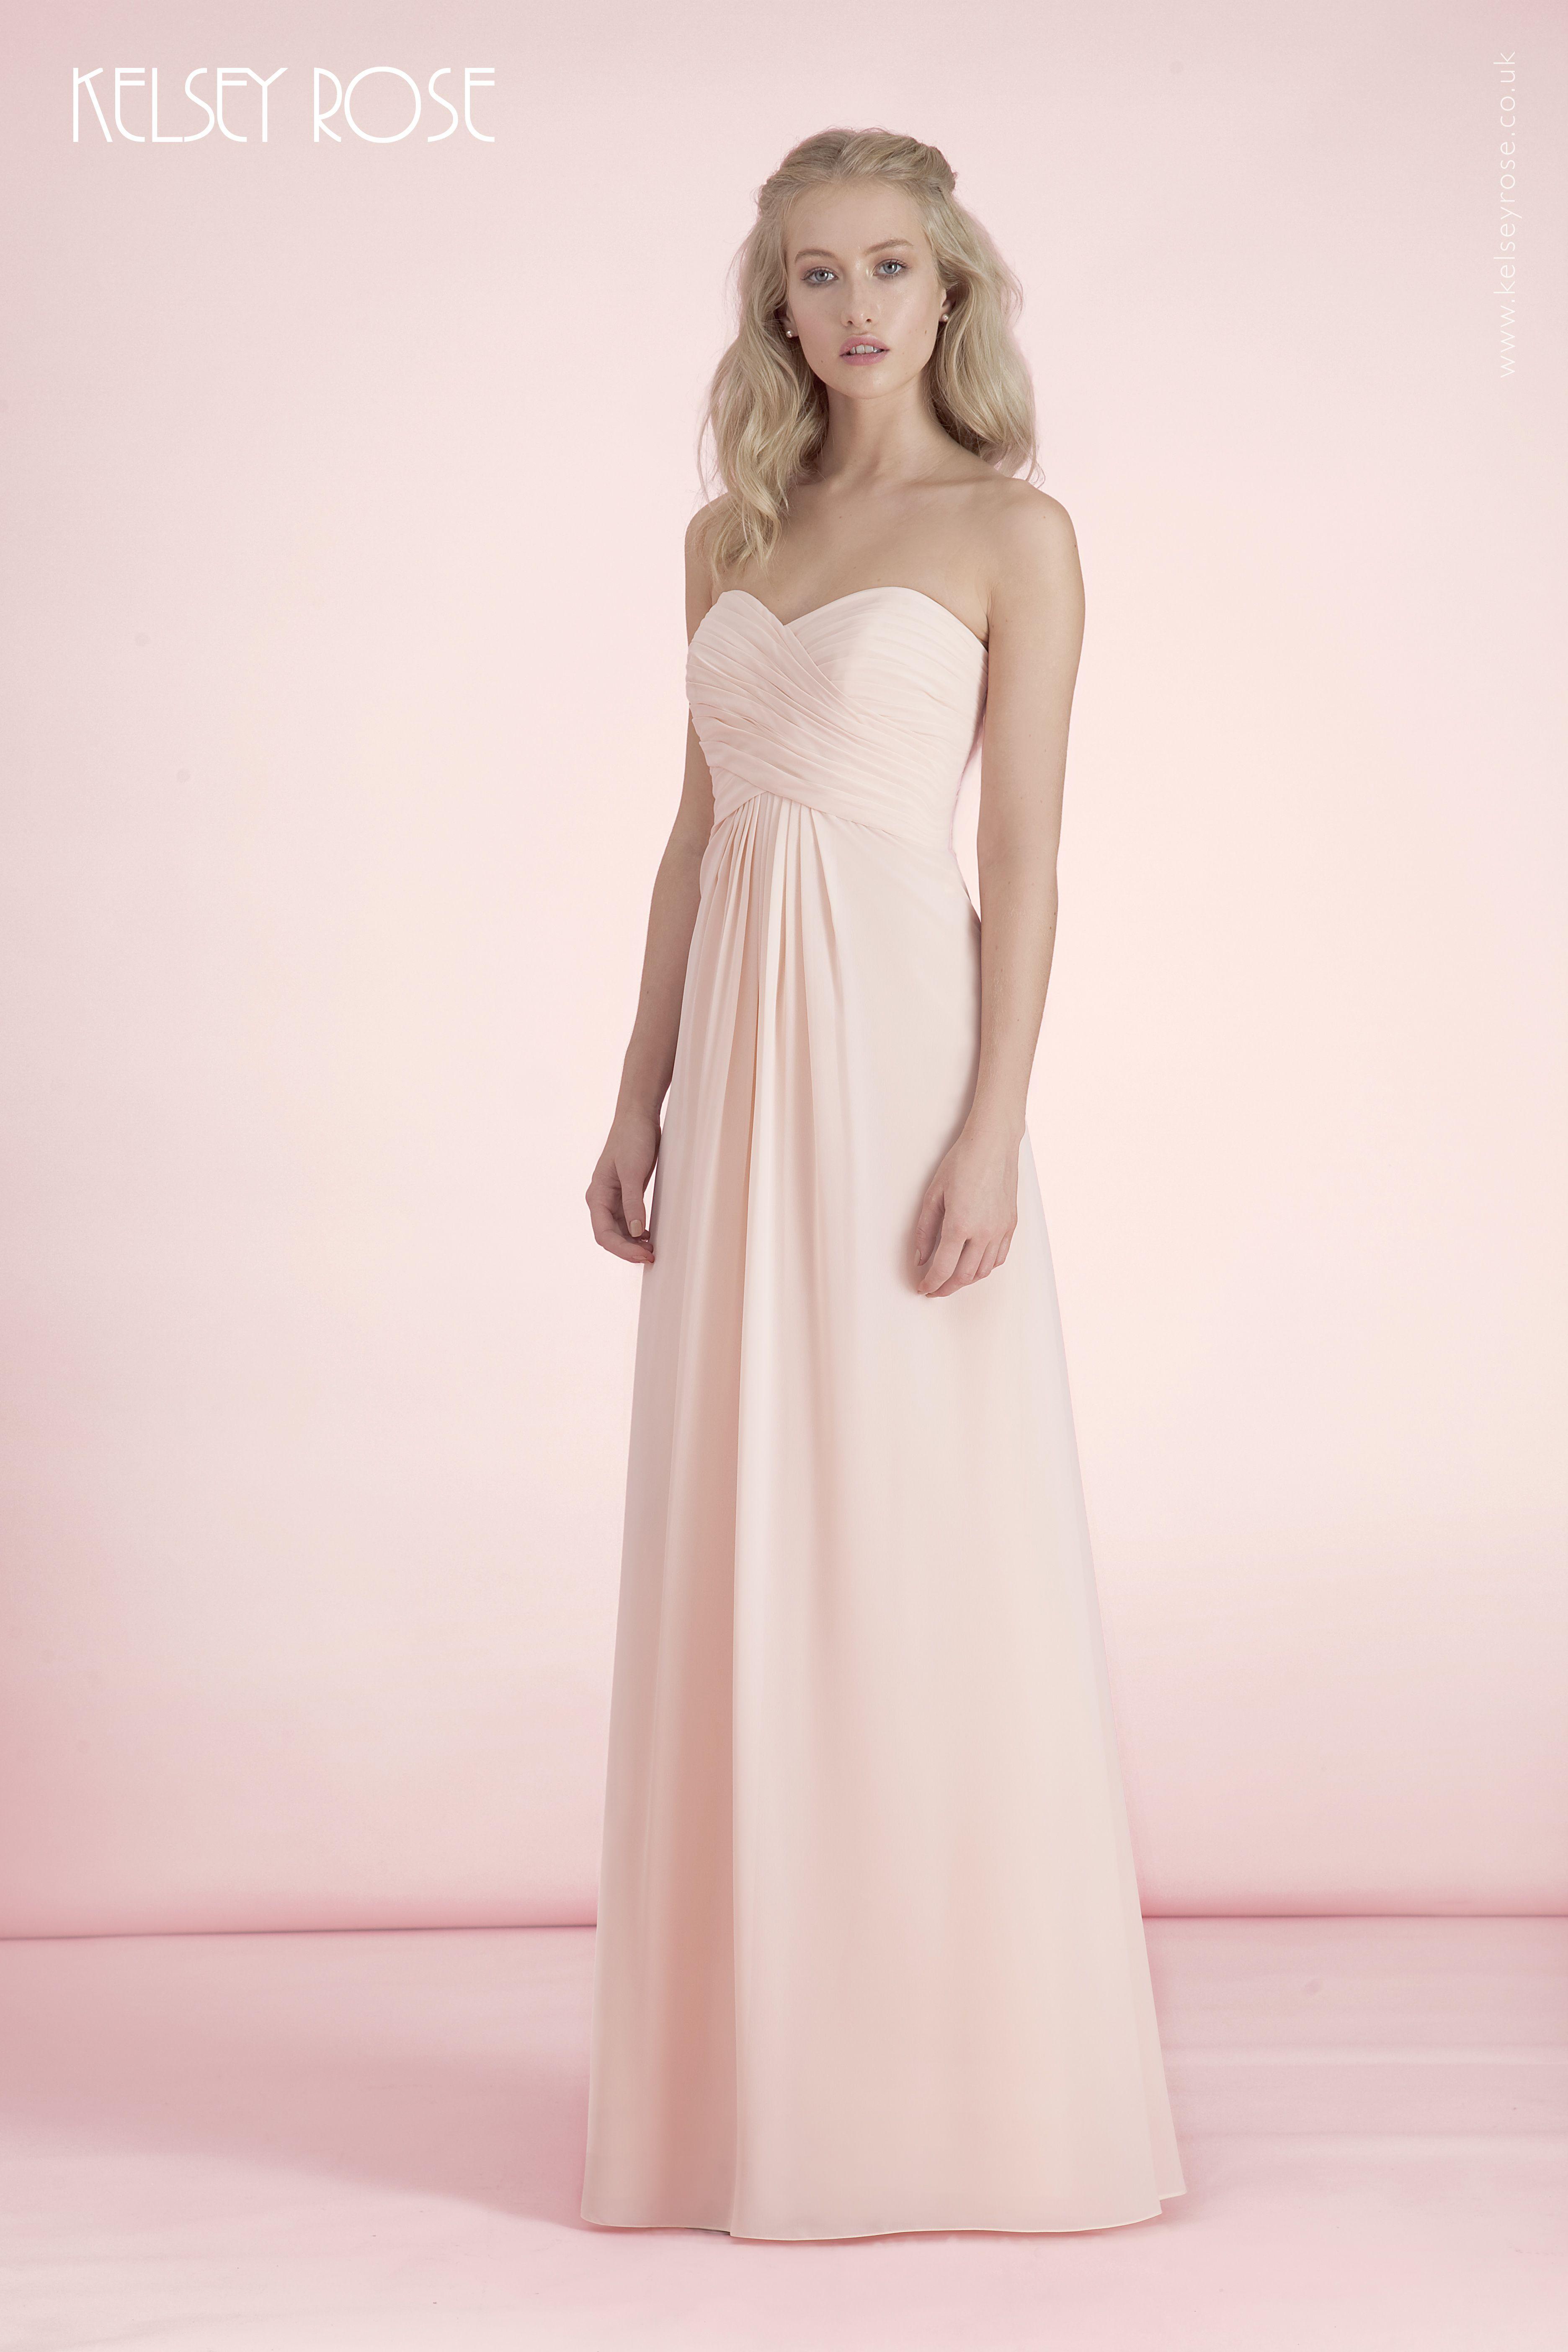 9f3db885efdc Kelsey Rose Bridesmaid Style 50113 | My Style | Pinterest